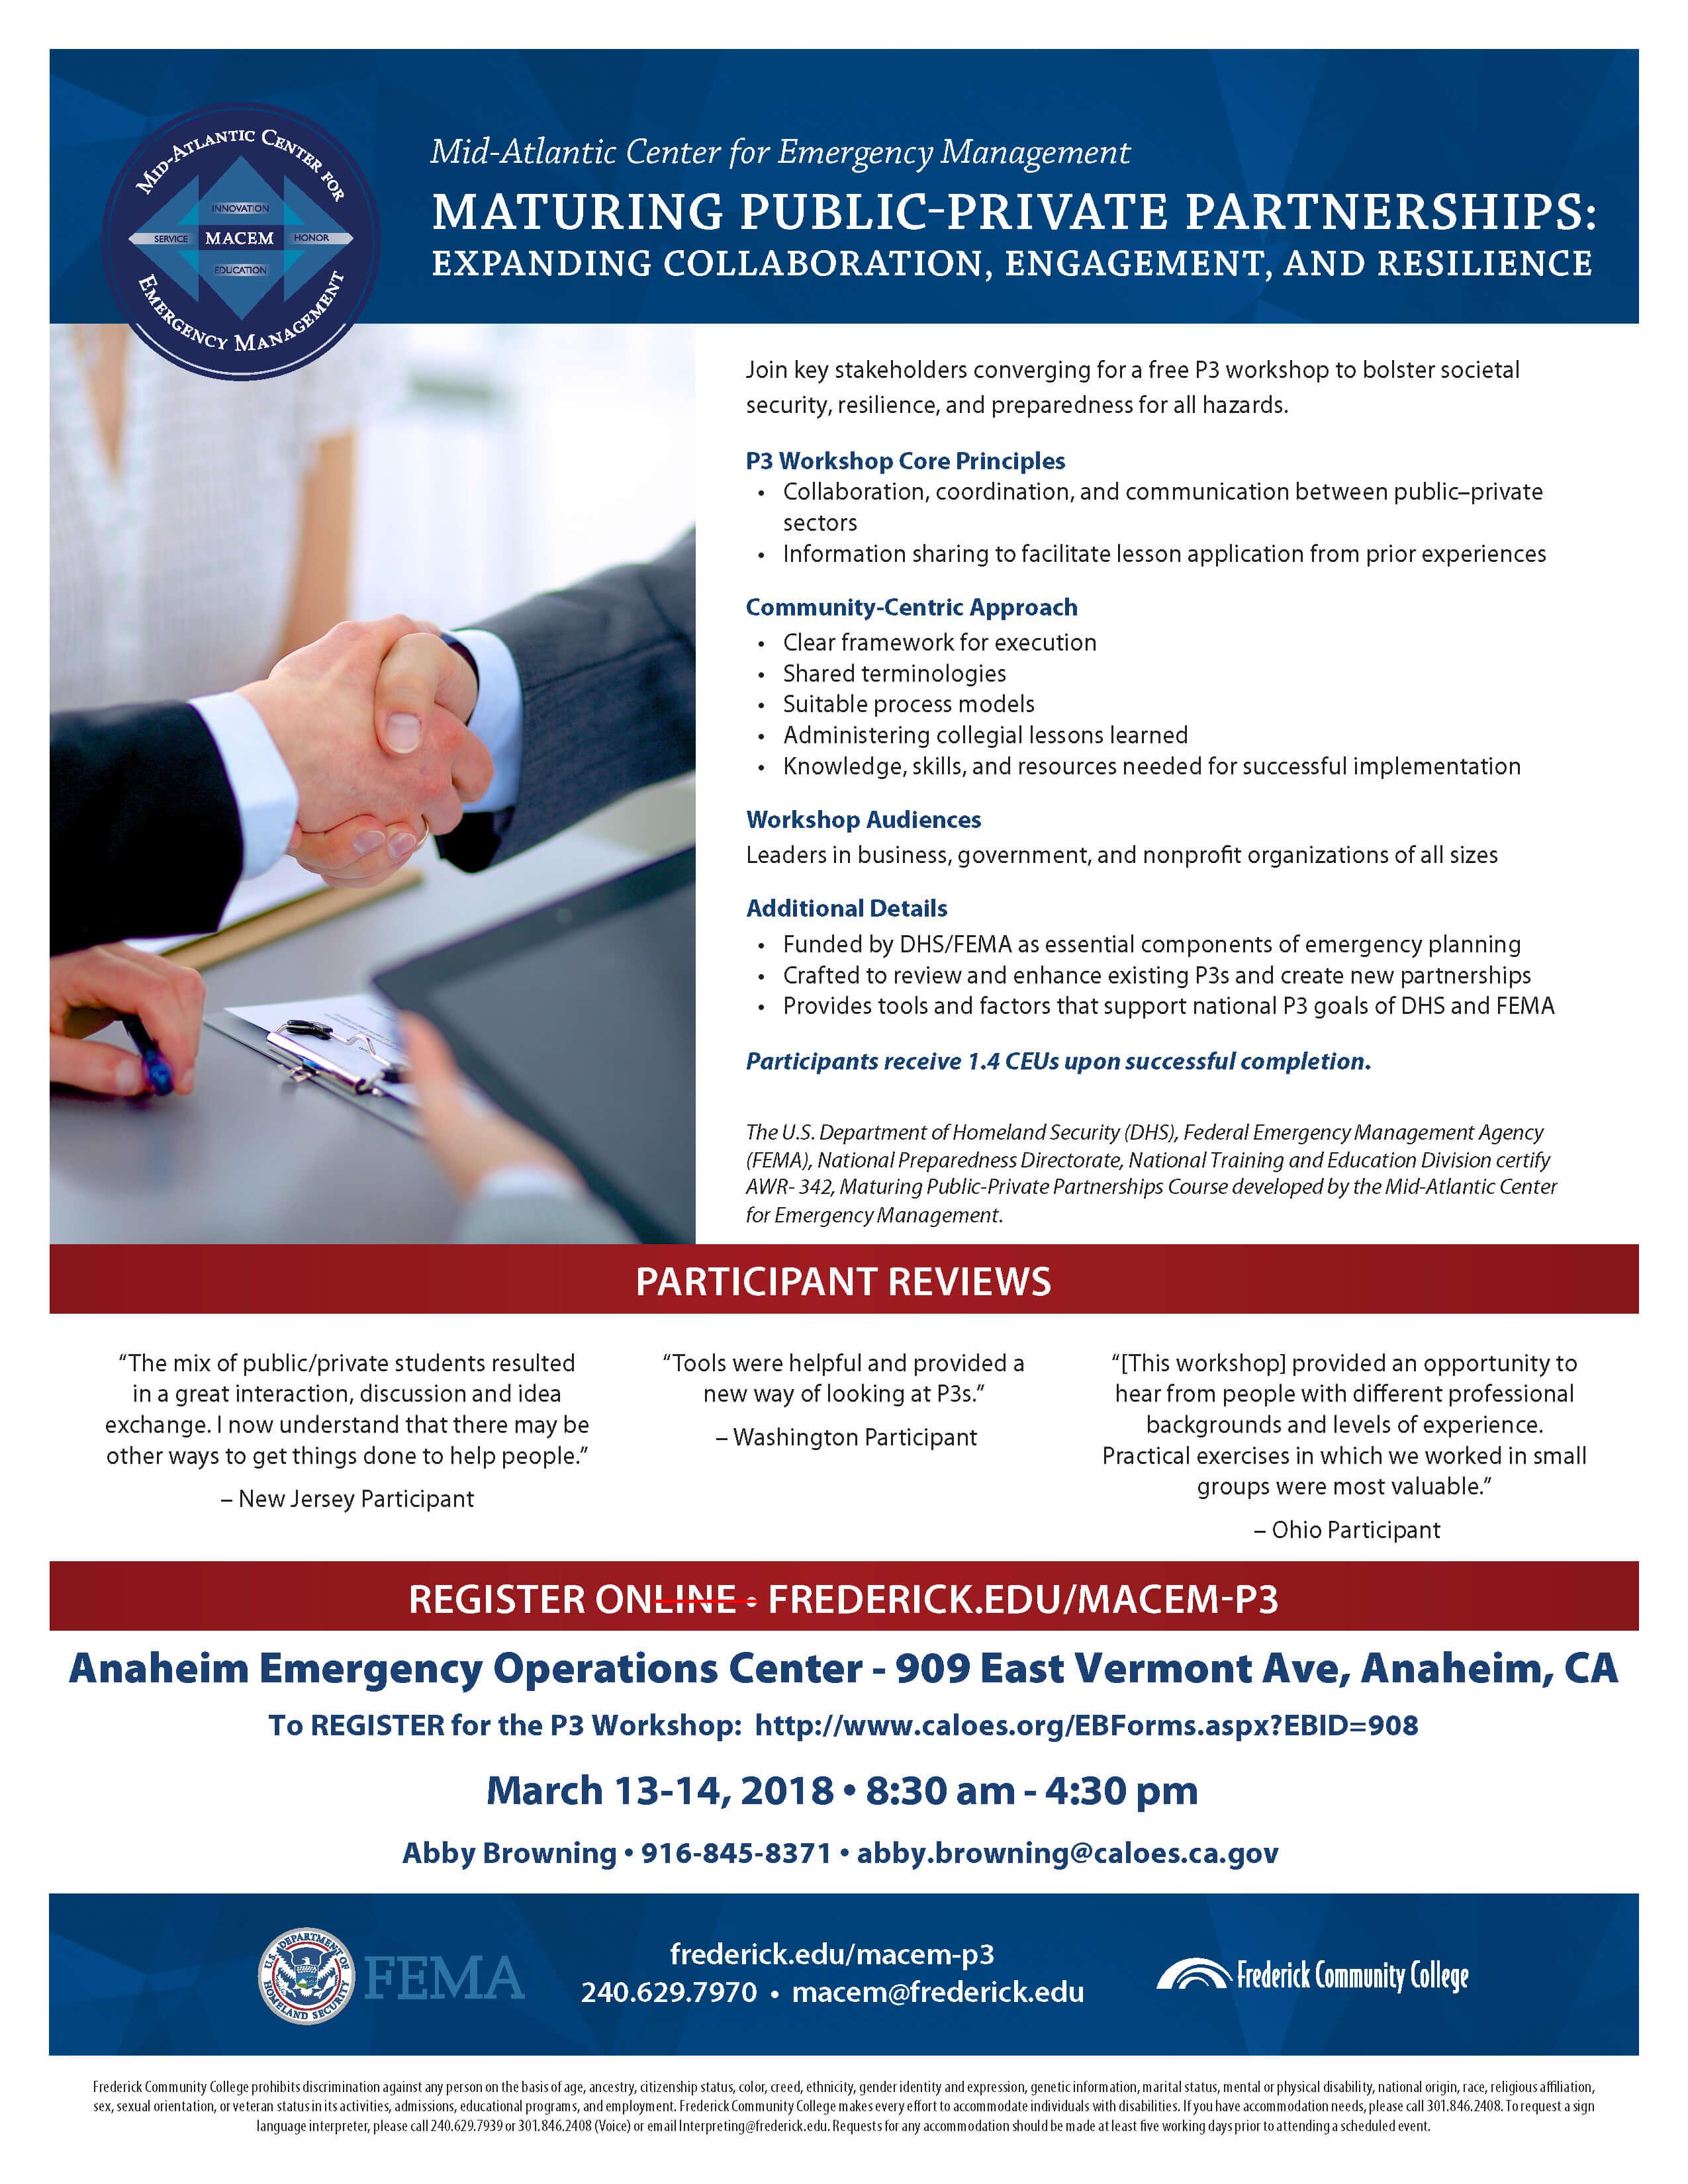 Maturing Public-Private Partnerships (P3) Workshop